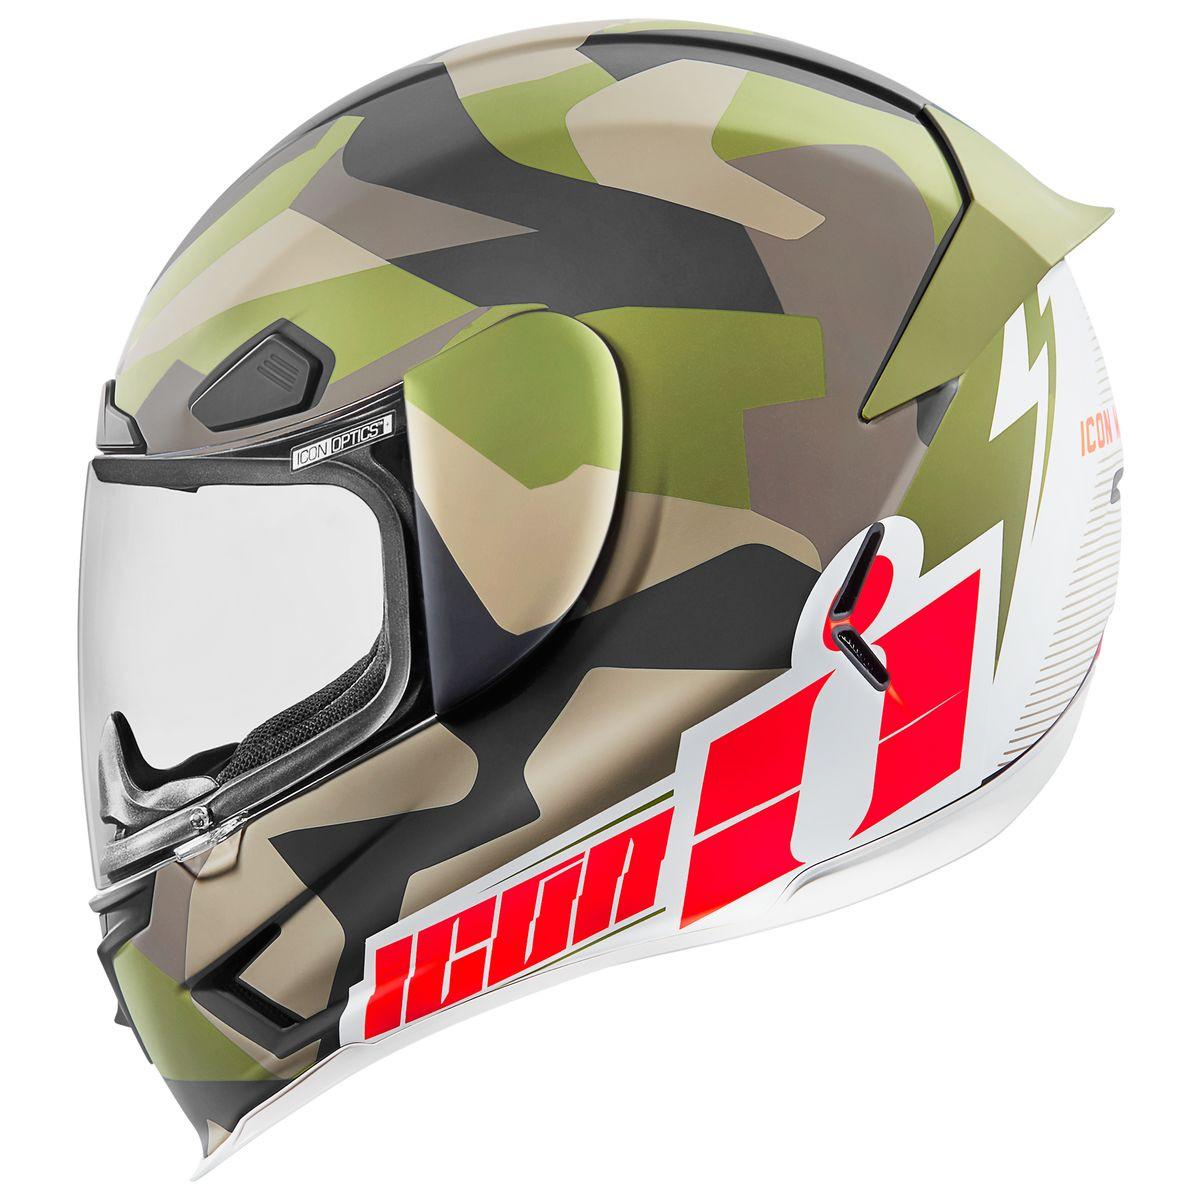 ... Icon Airframe Pro Deployed Helmet 2 ...